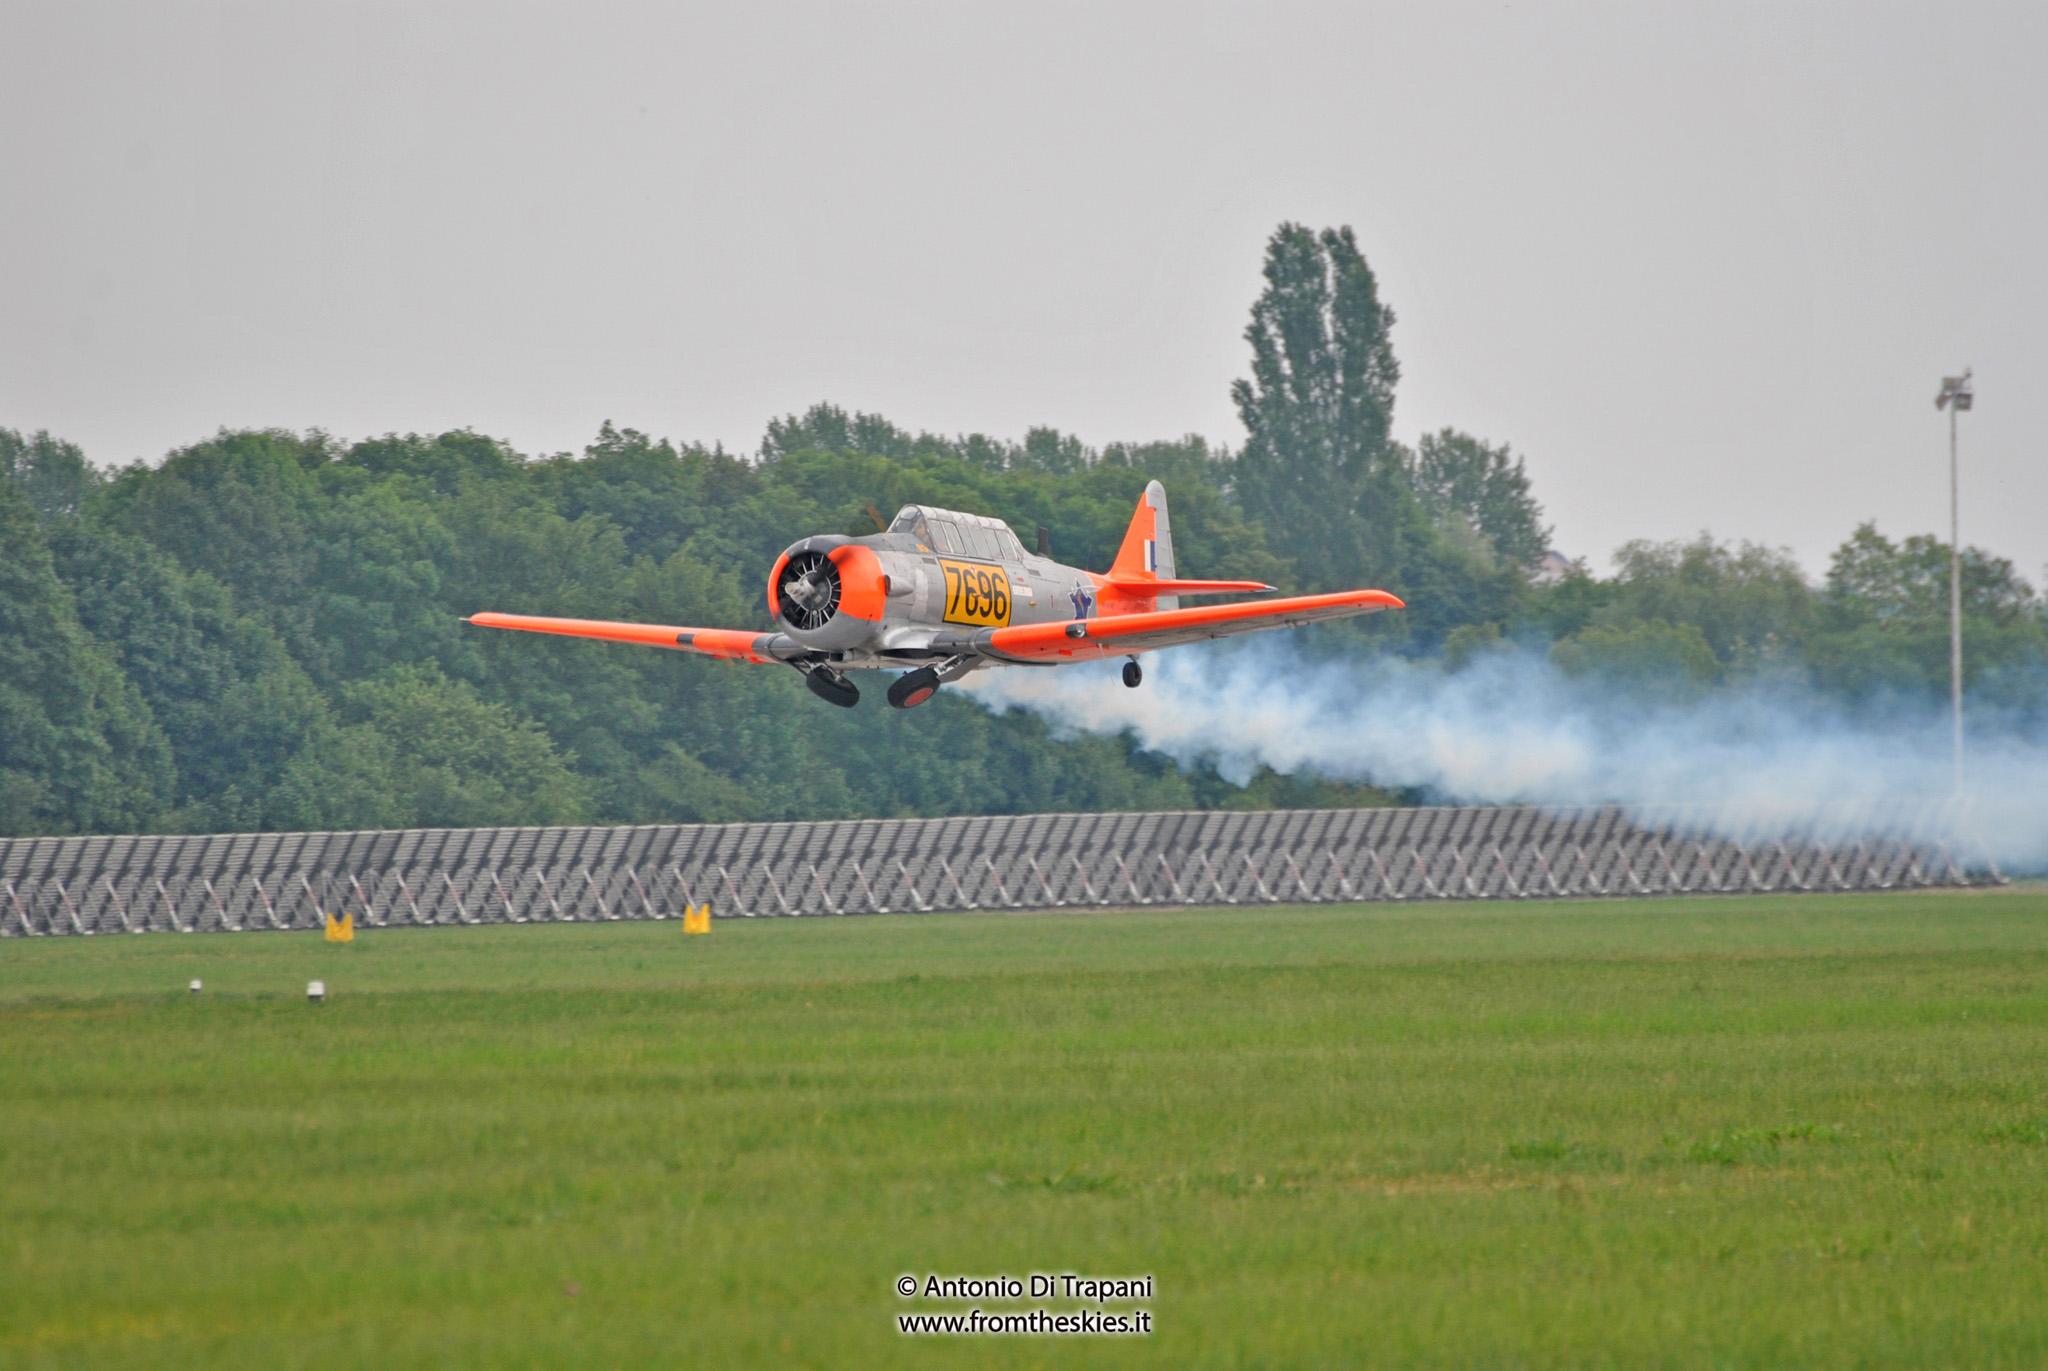 T6 Harvard SAAF - Pardubice Air Show 2016 (2)